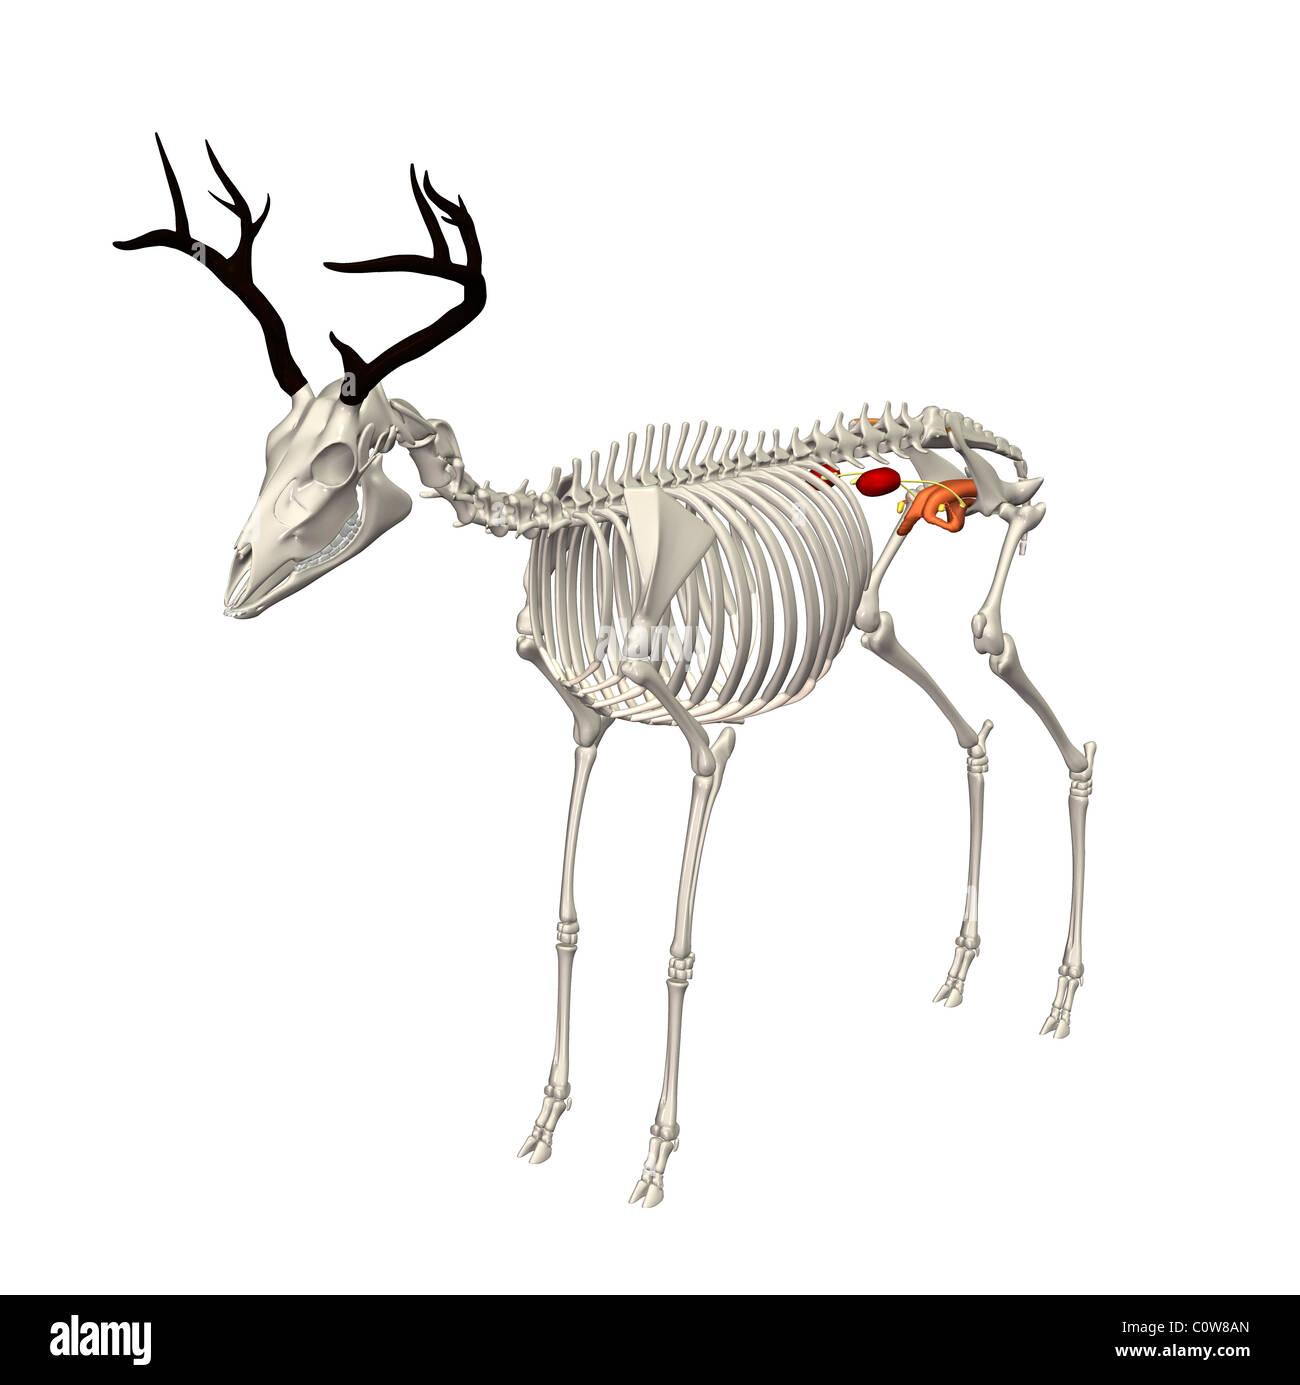 deer anatomy urinary skeleton transparent body - Stock Image